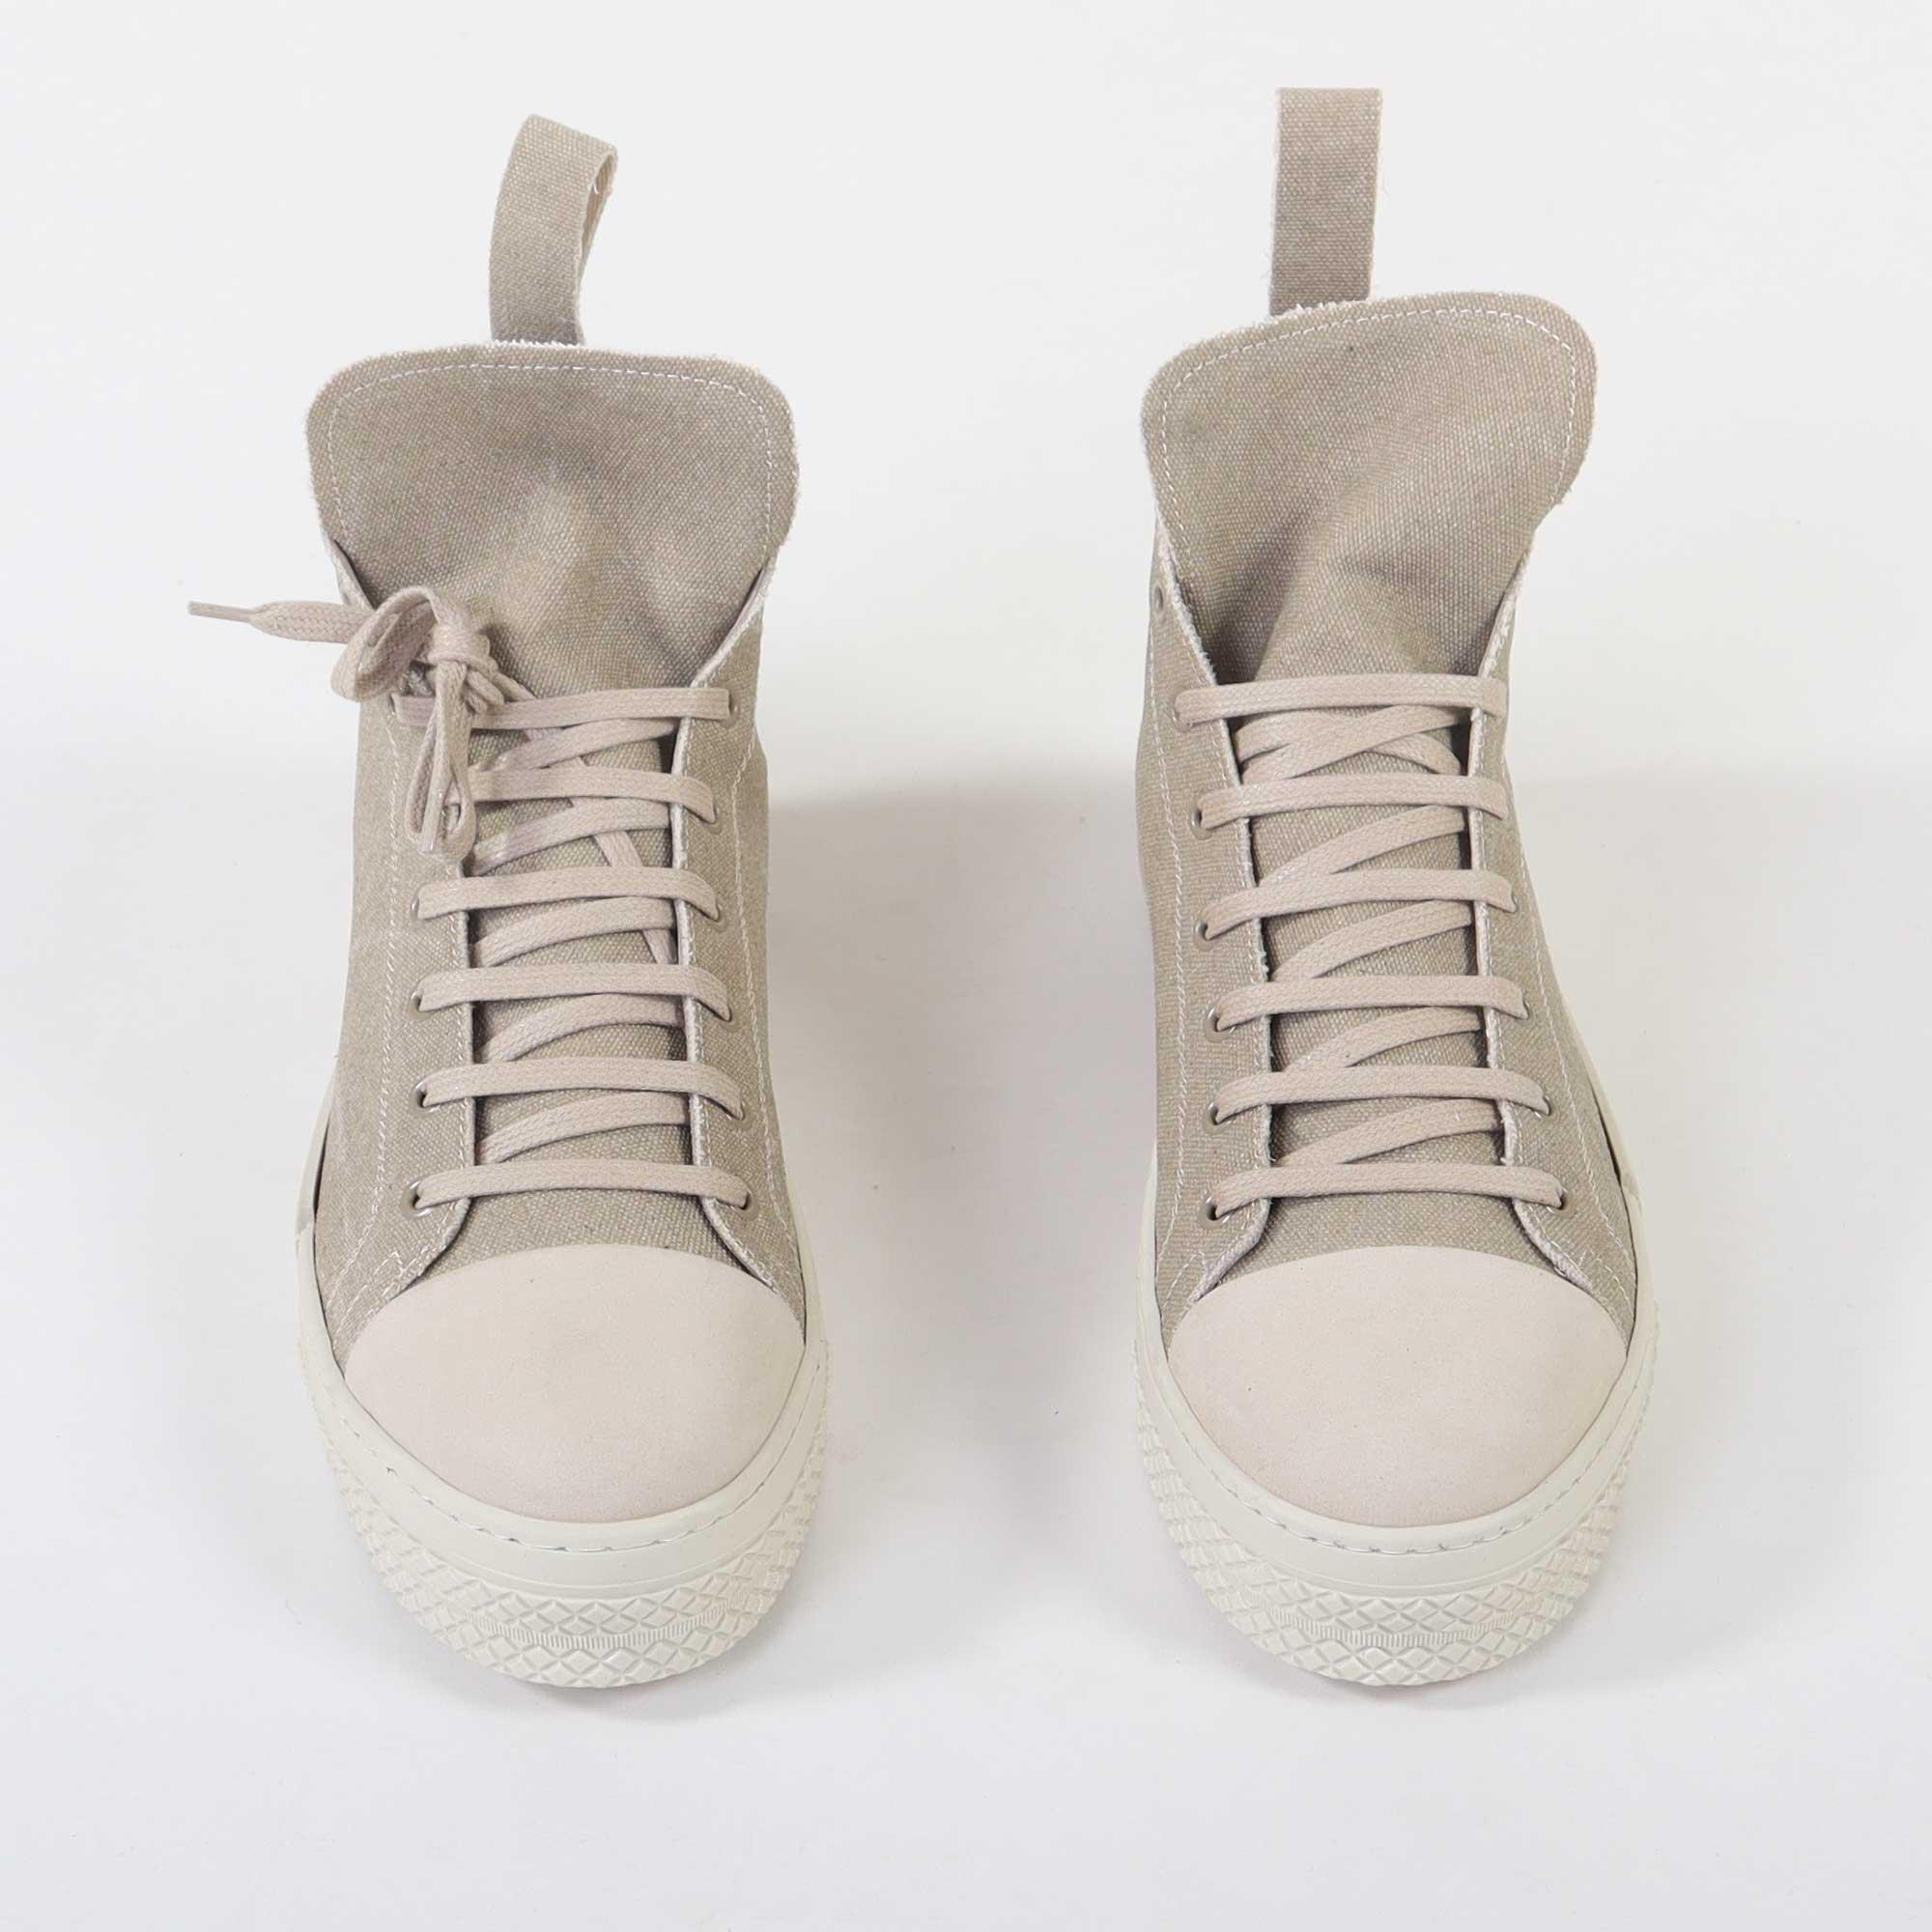 sneakers-beige-5